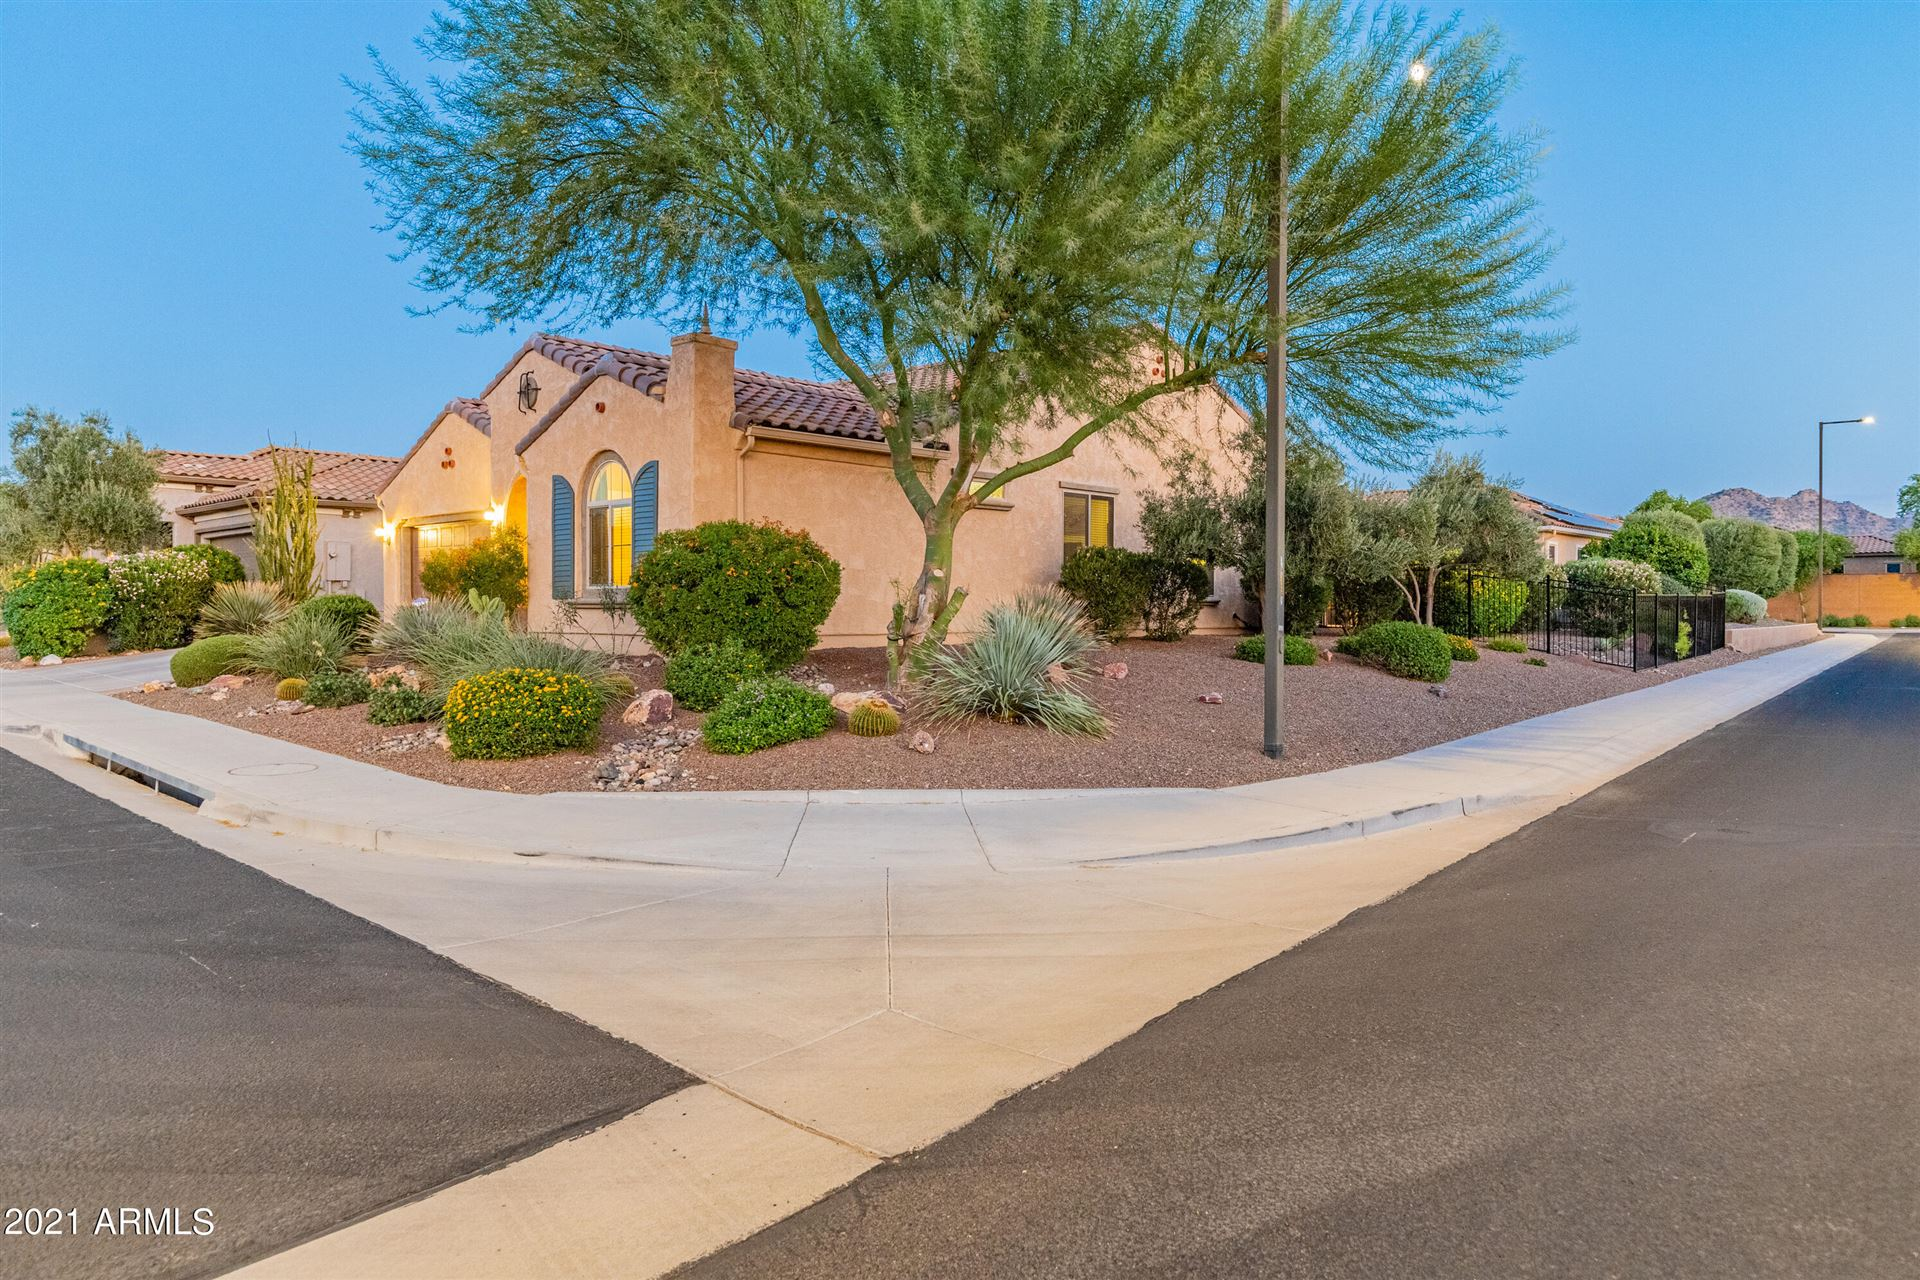 Photo of 27097 W SEQUOIA Drive, Buckeye, AZ 85396 (MLS # 6295762)